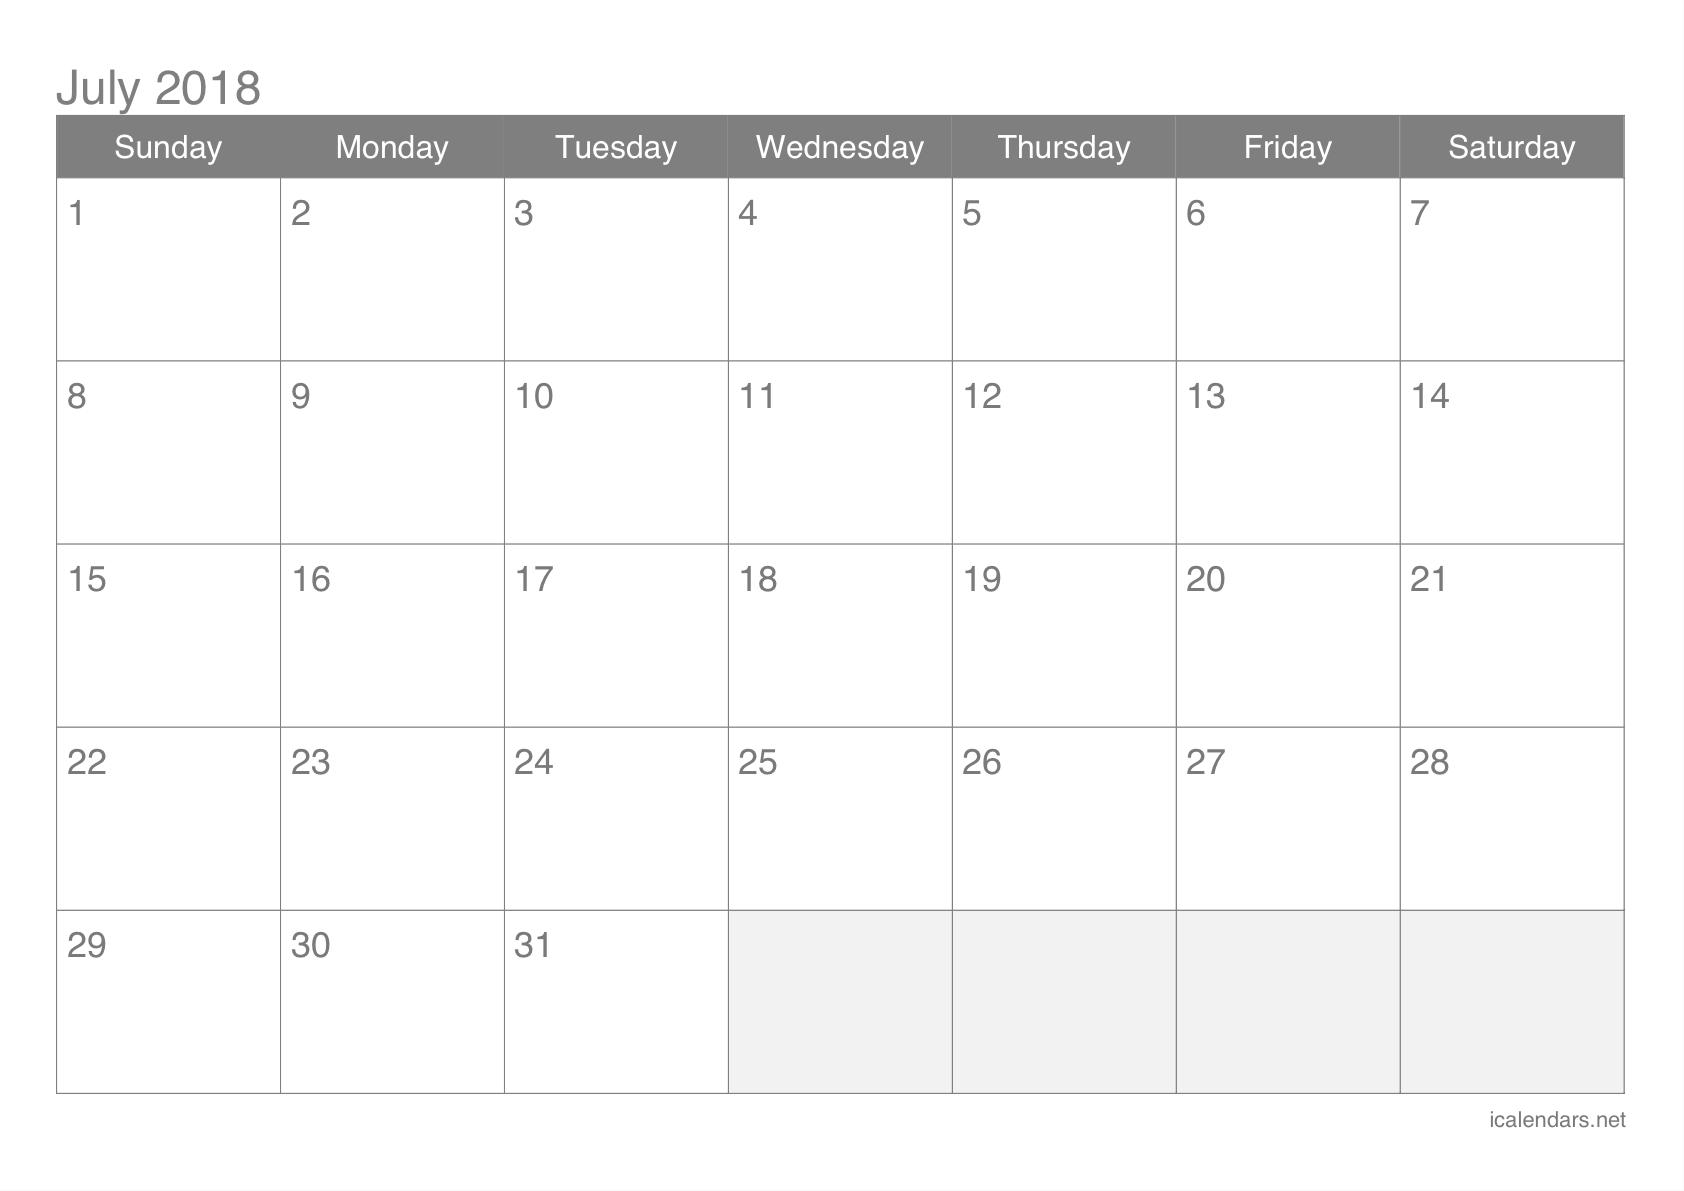 July 2018 Printable Calendar - Icalendars